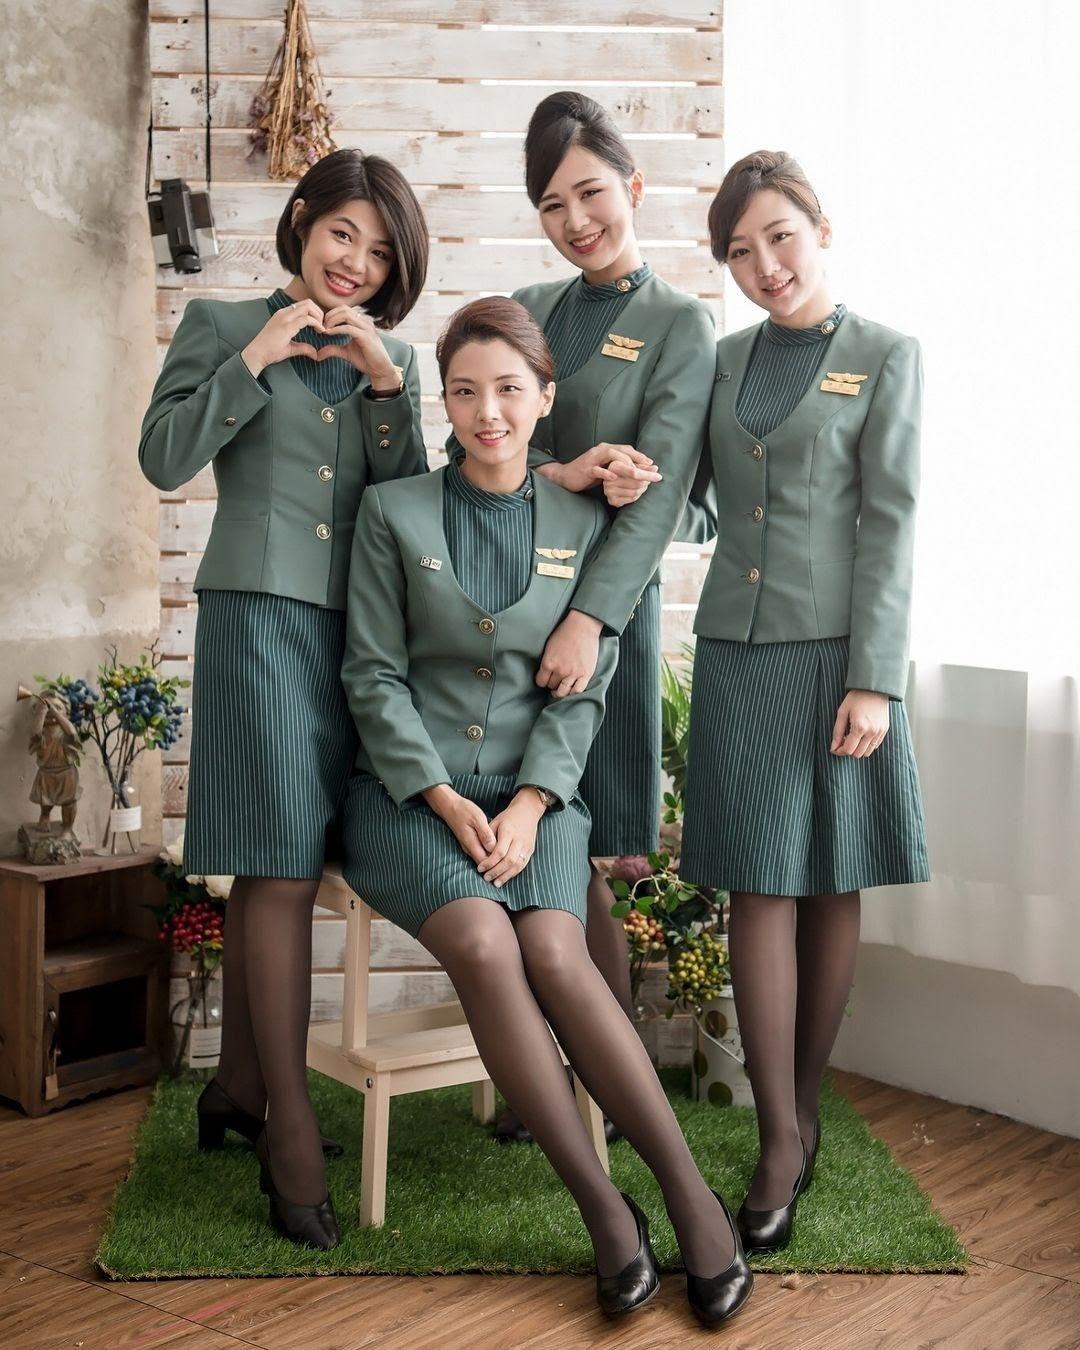 Eva Air Taiwan Asian Flight Attendants / Cabin Crew in